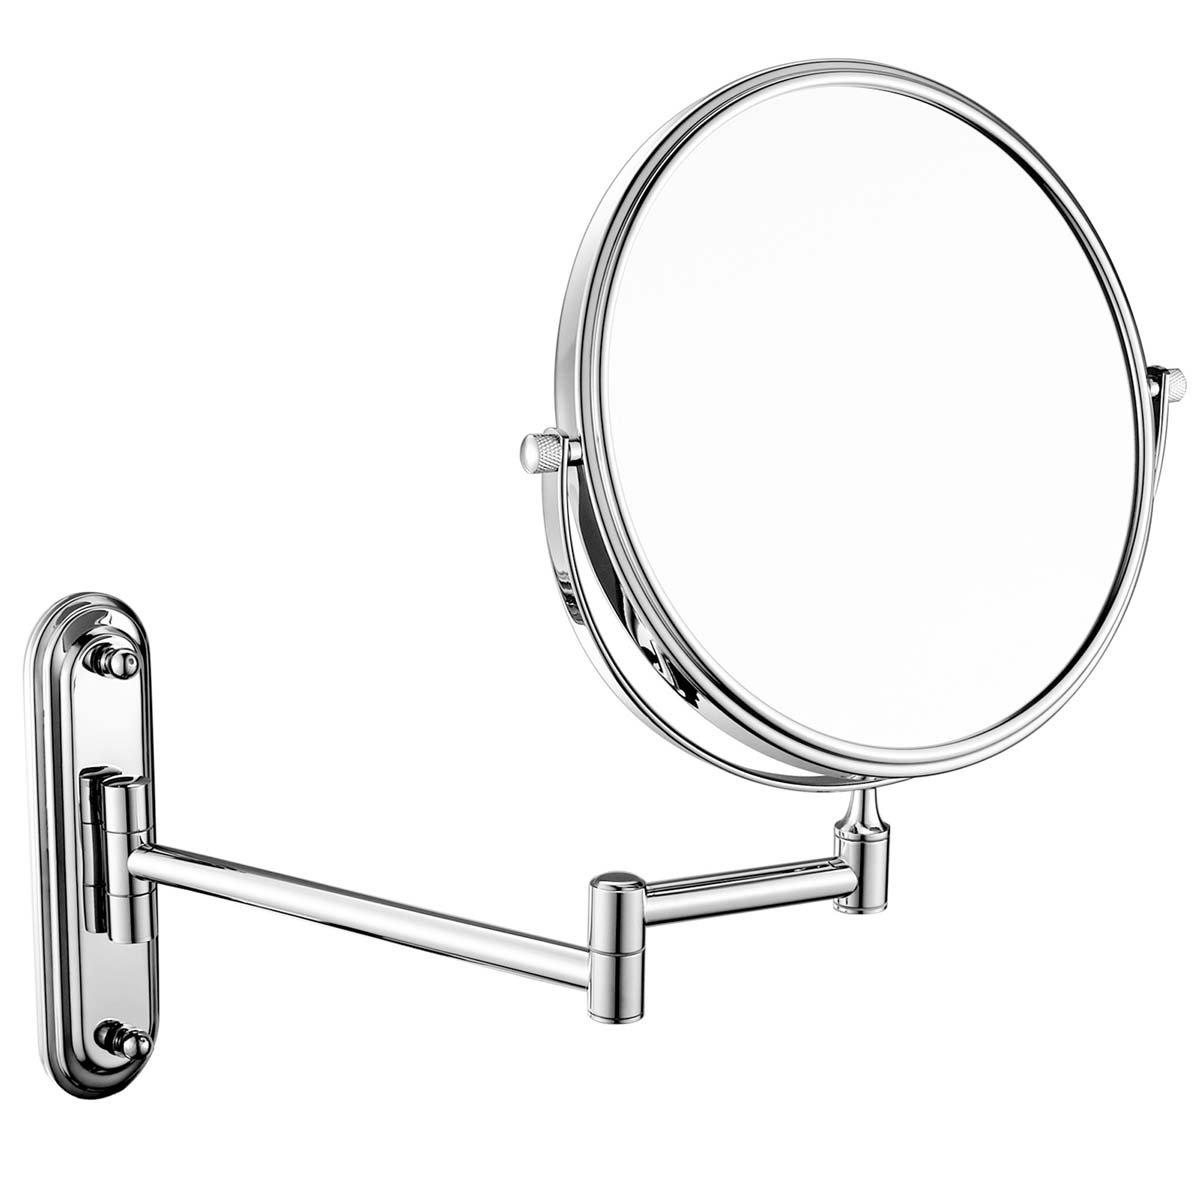 J&A Wall-Mounted Beauty Mirror, Folding Creative Magnifying Mirror, Bathroom Mirror, Shaving Mirror, Tail Fixed Folding Mirror